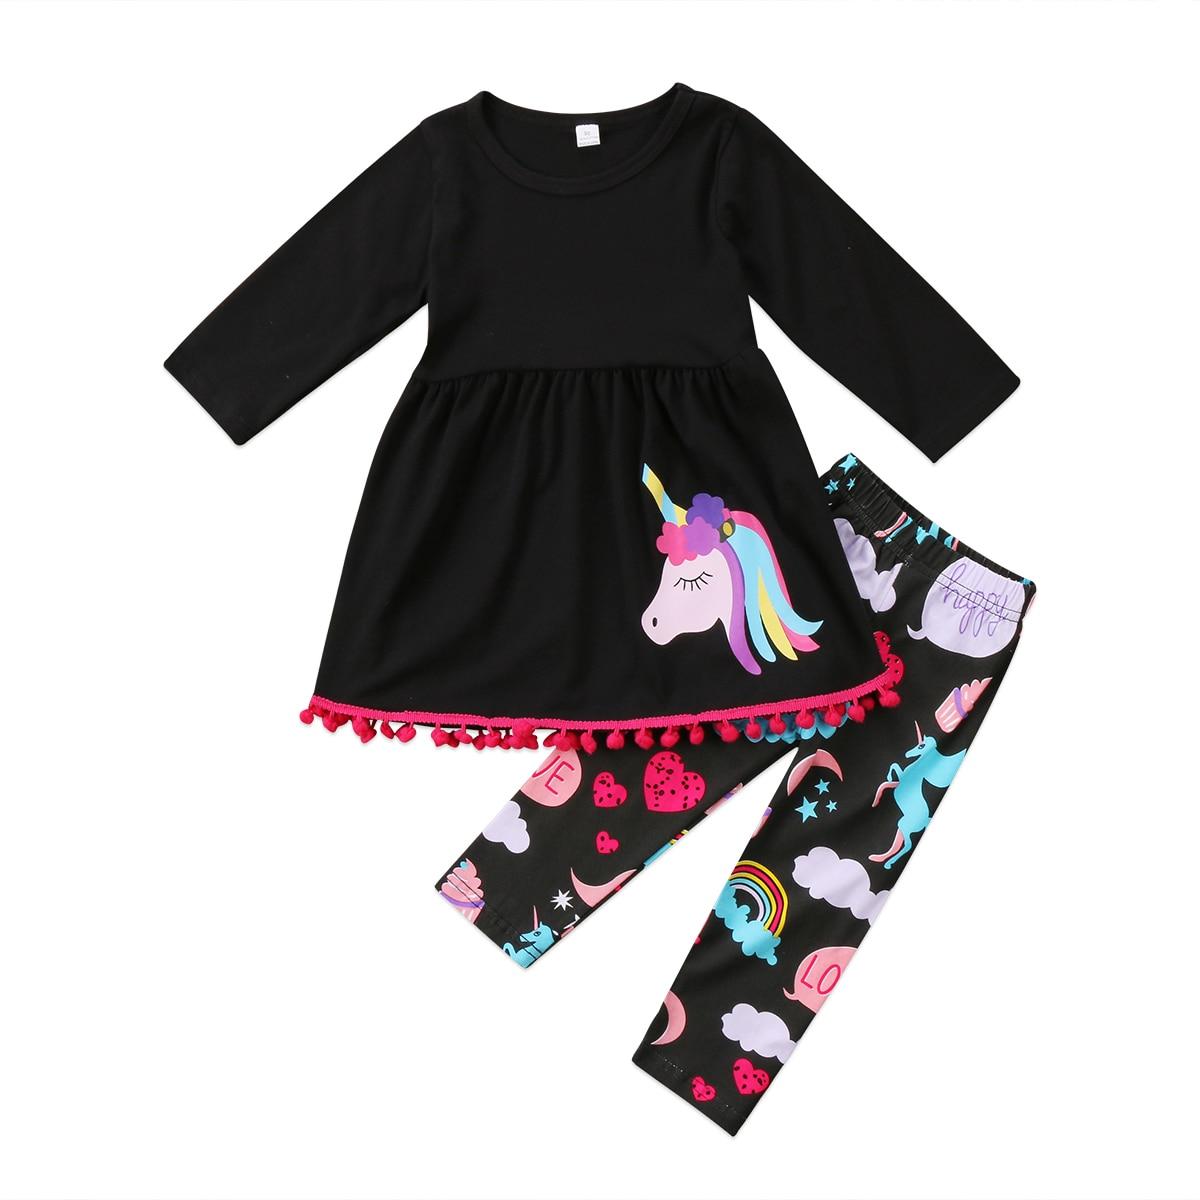 2017 Xmas Peuter Kids Baby Meisjes Outfit Kleding Jurk Top Shirt + Regenboog Print Broek 2 stks Set Maat 3-7 T